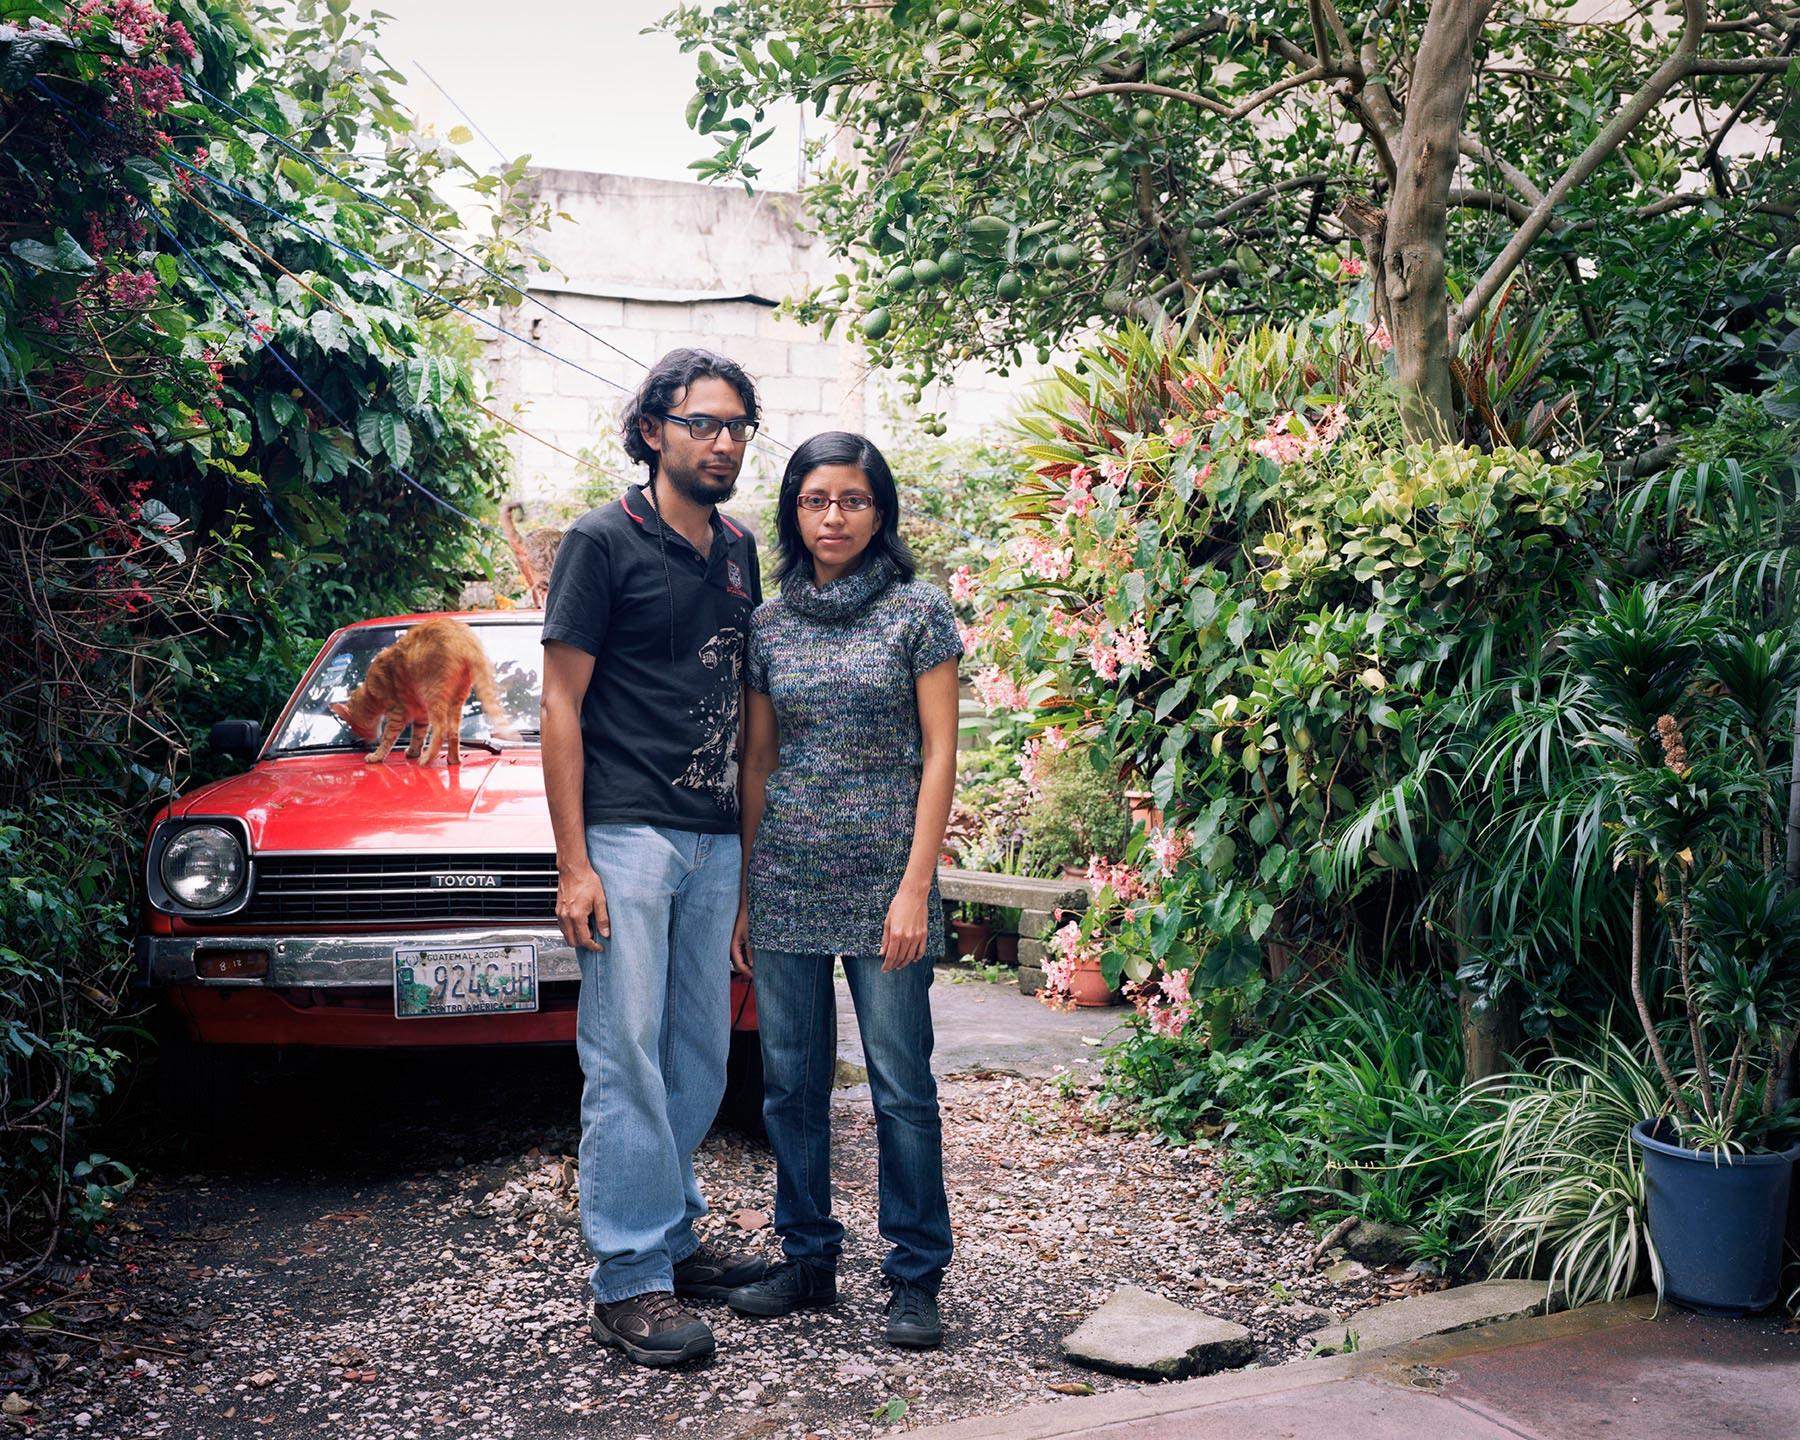 Flavio and Linda